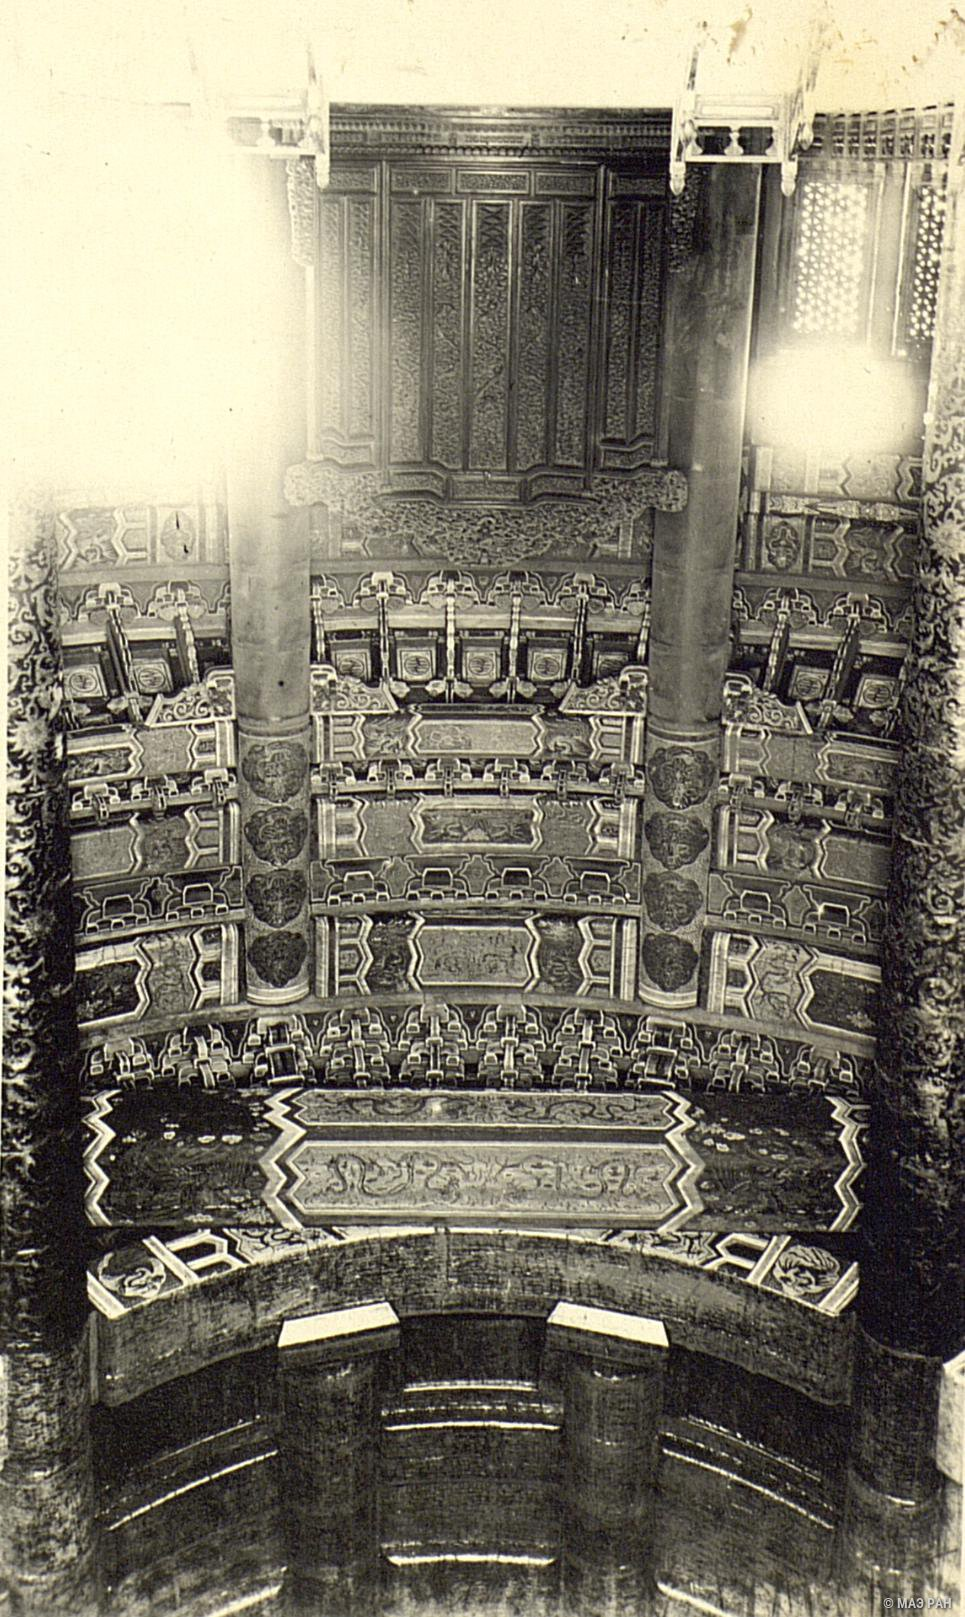 Храм Неба. Интерьер круглого павильона Жертвеных молитв